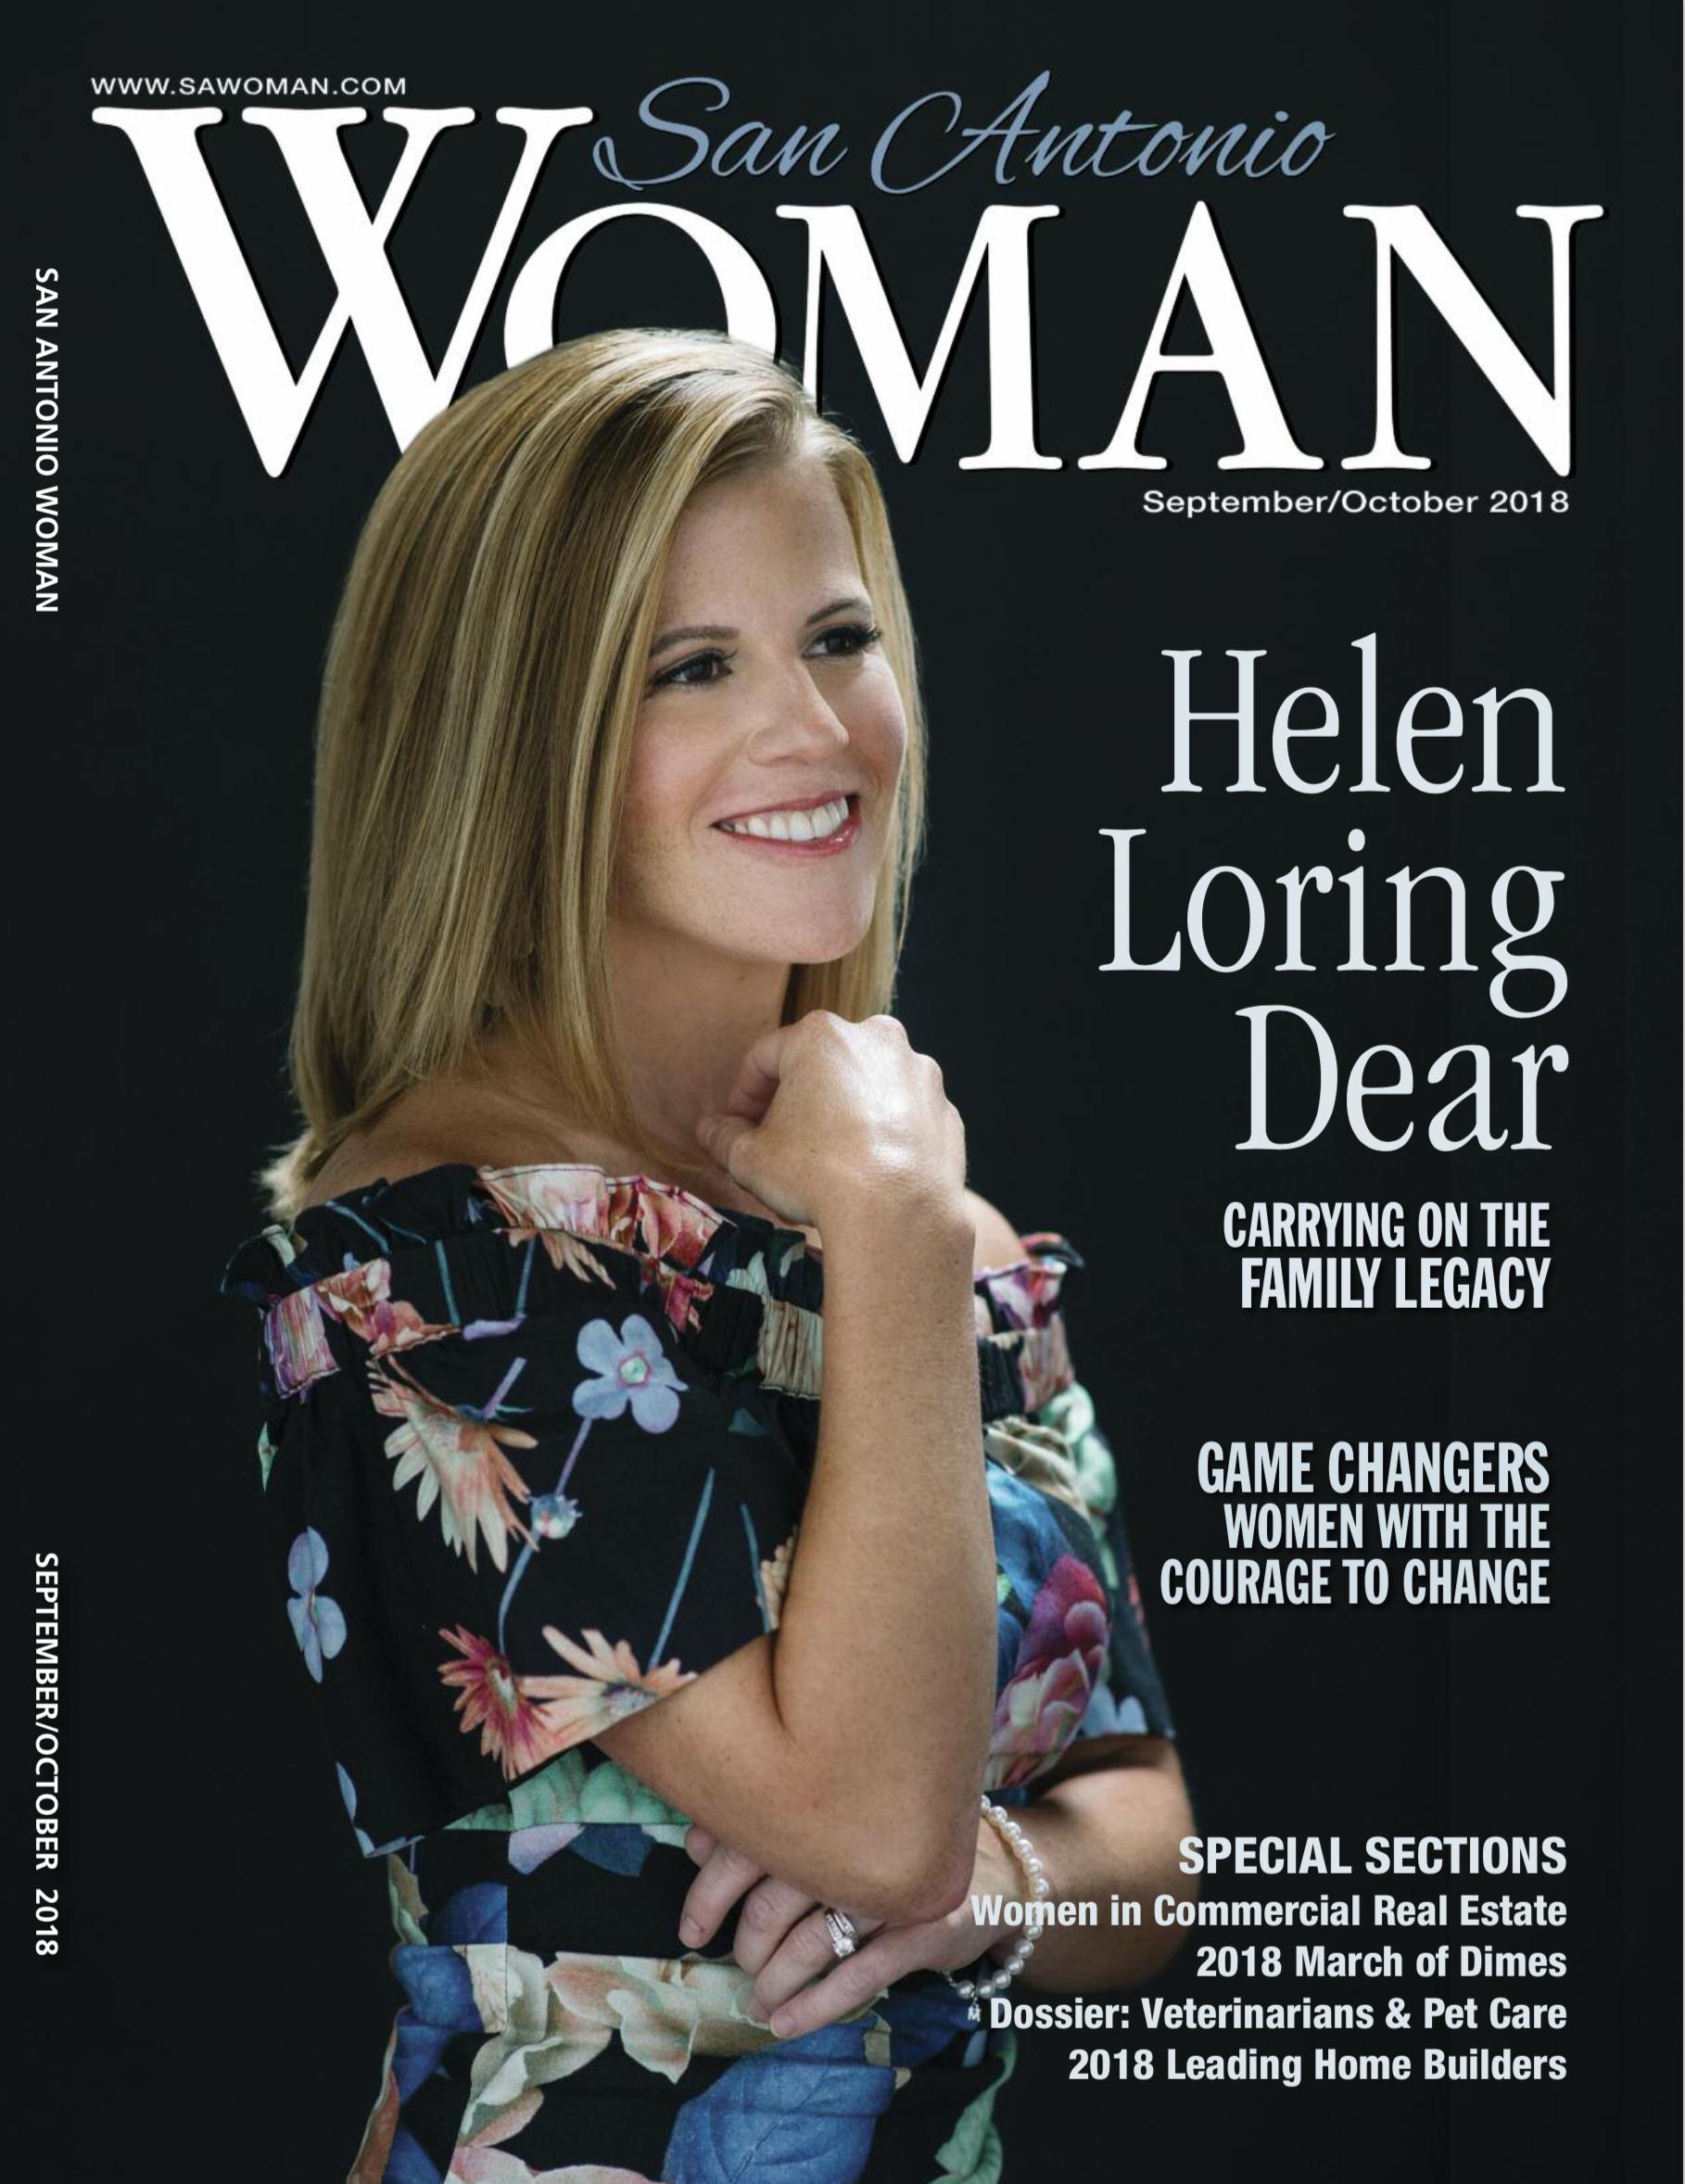 Cover of current San Antonio Woman magazine